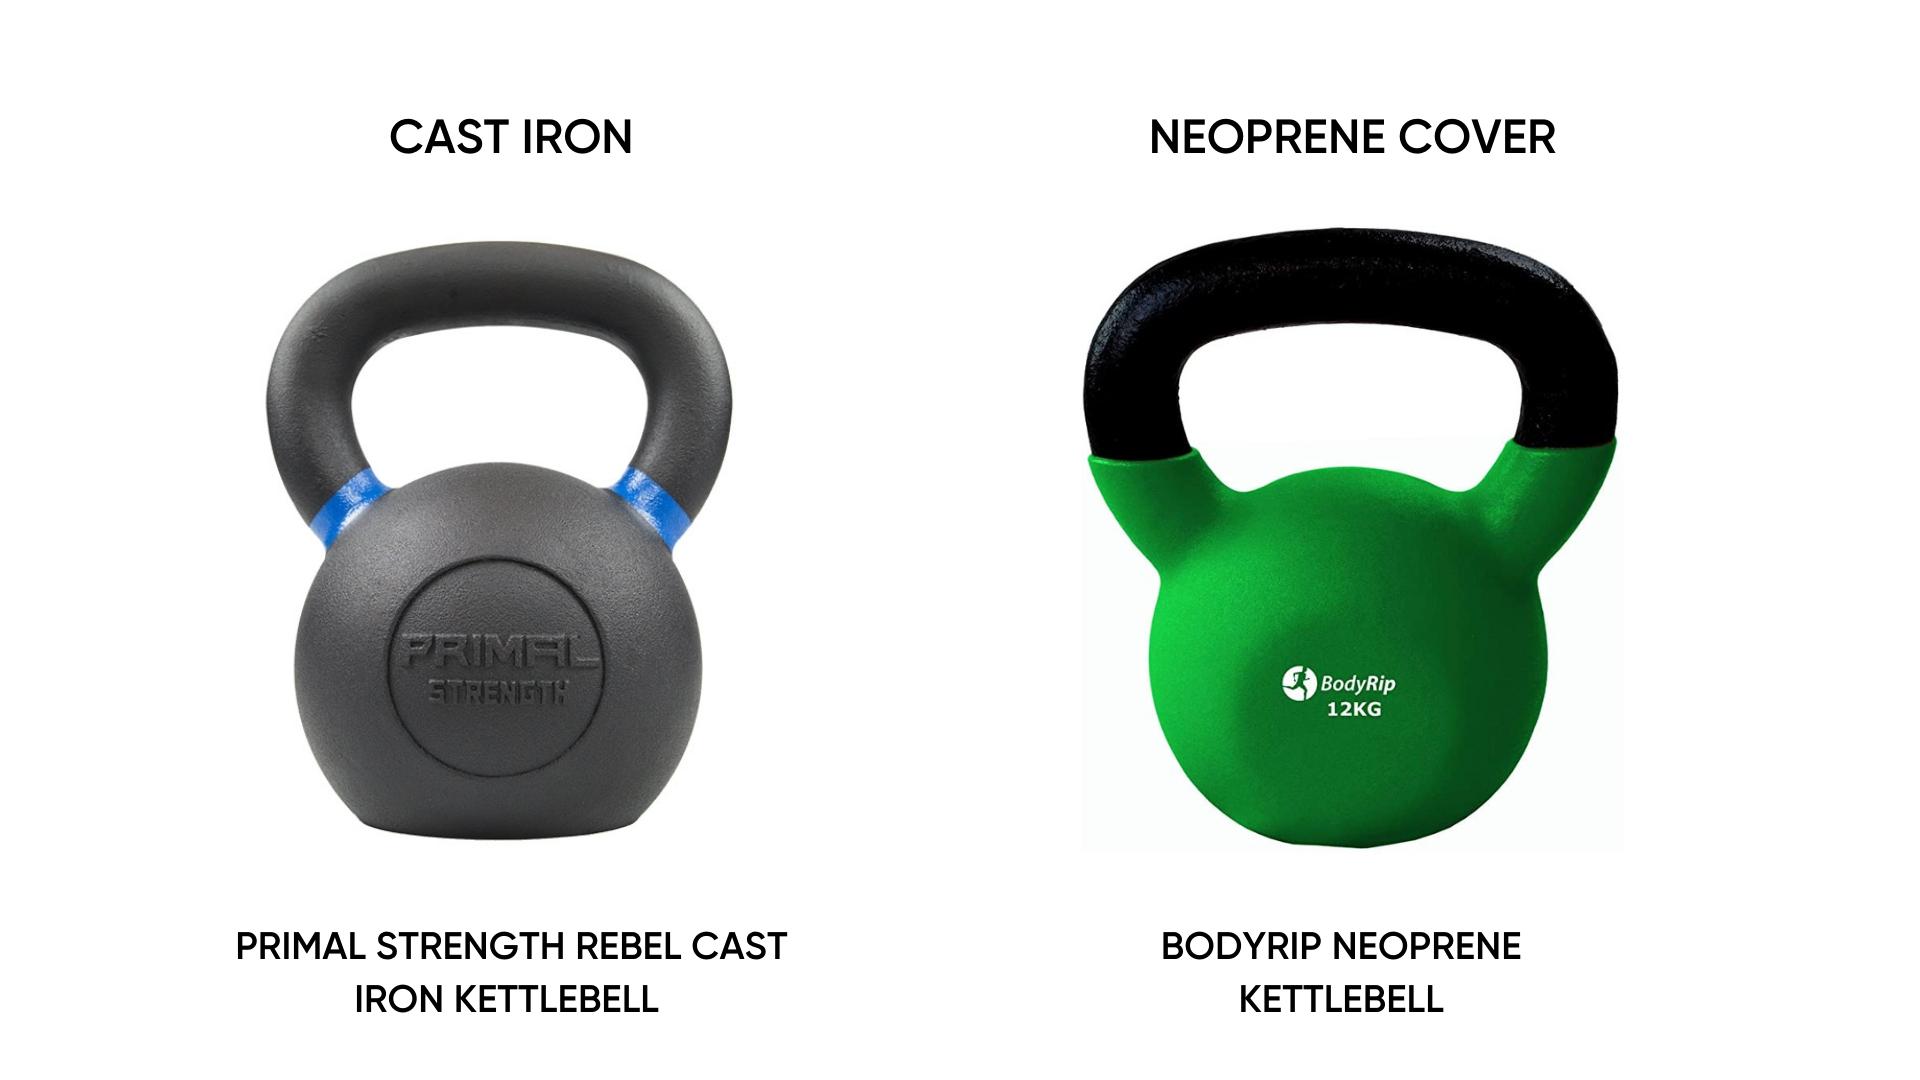 Cast Iron and Neoprene Kettlebells